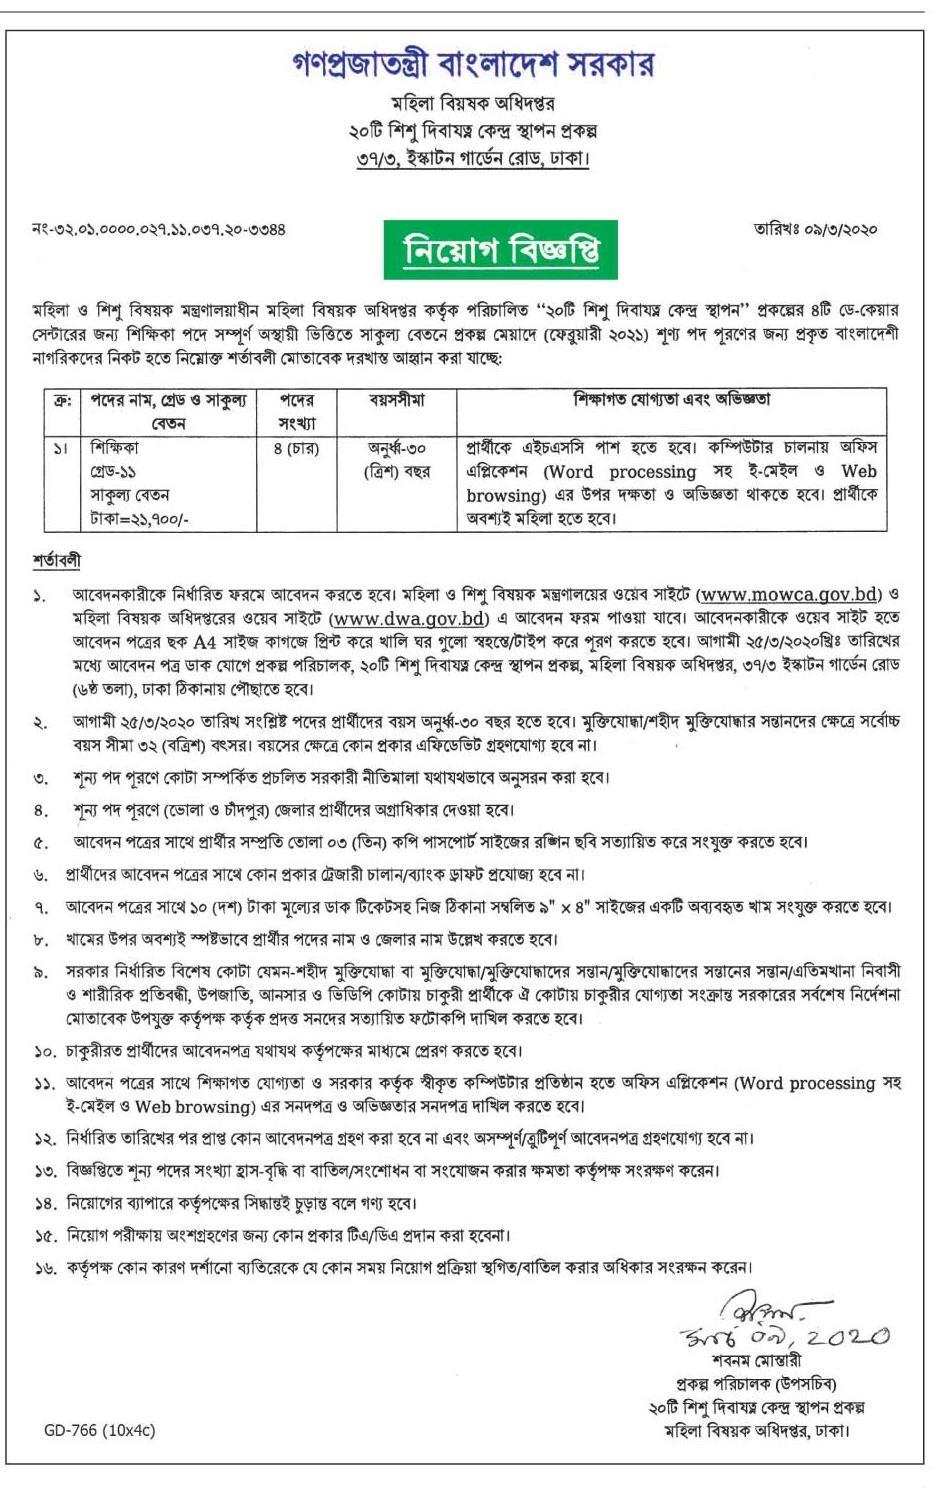 Directorate of Women Affairs Job Circular 2020